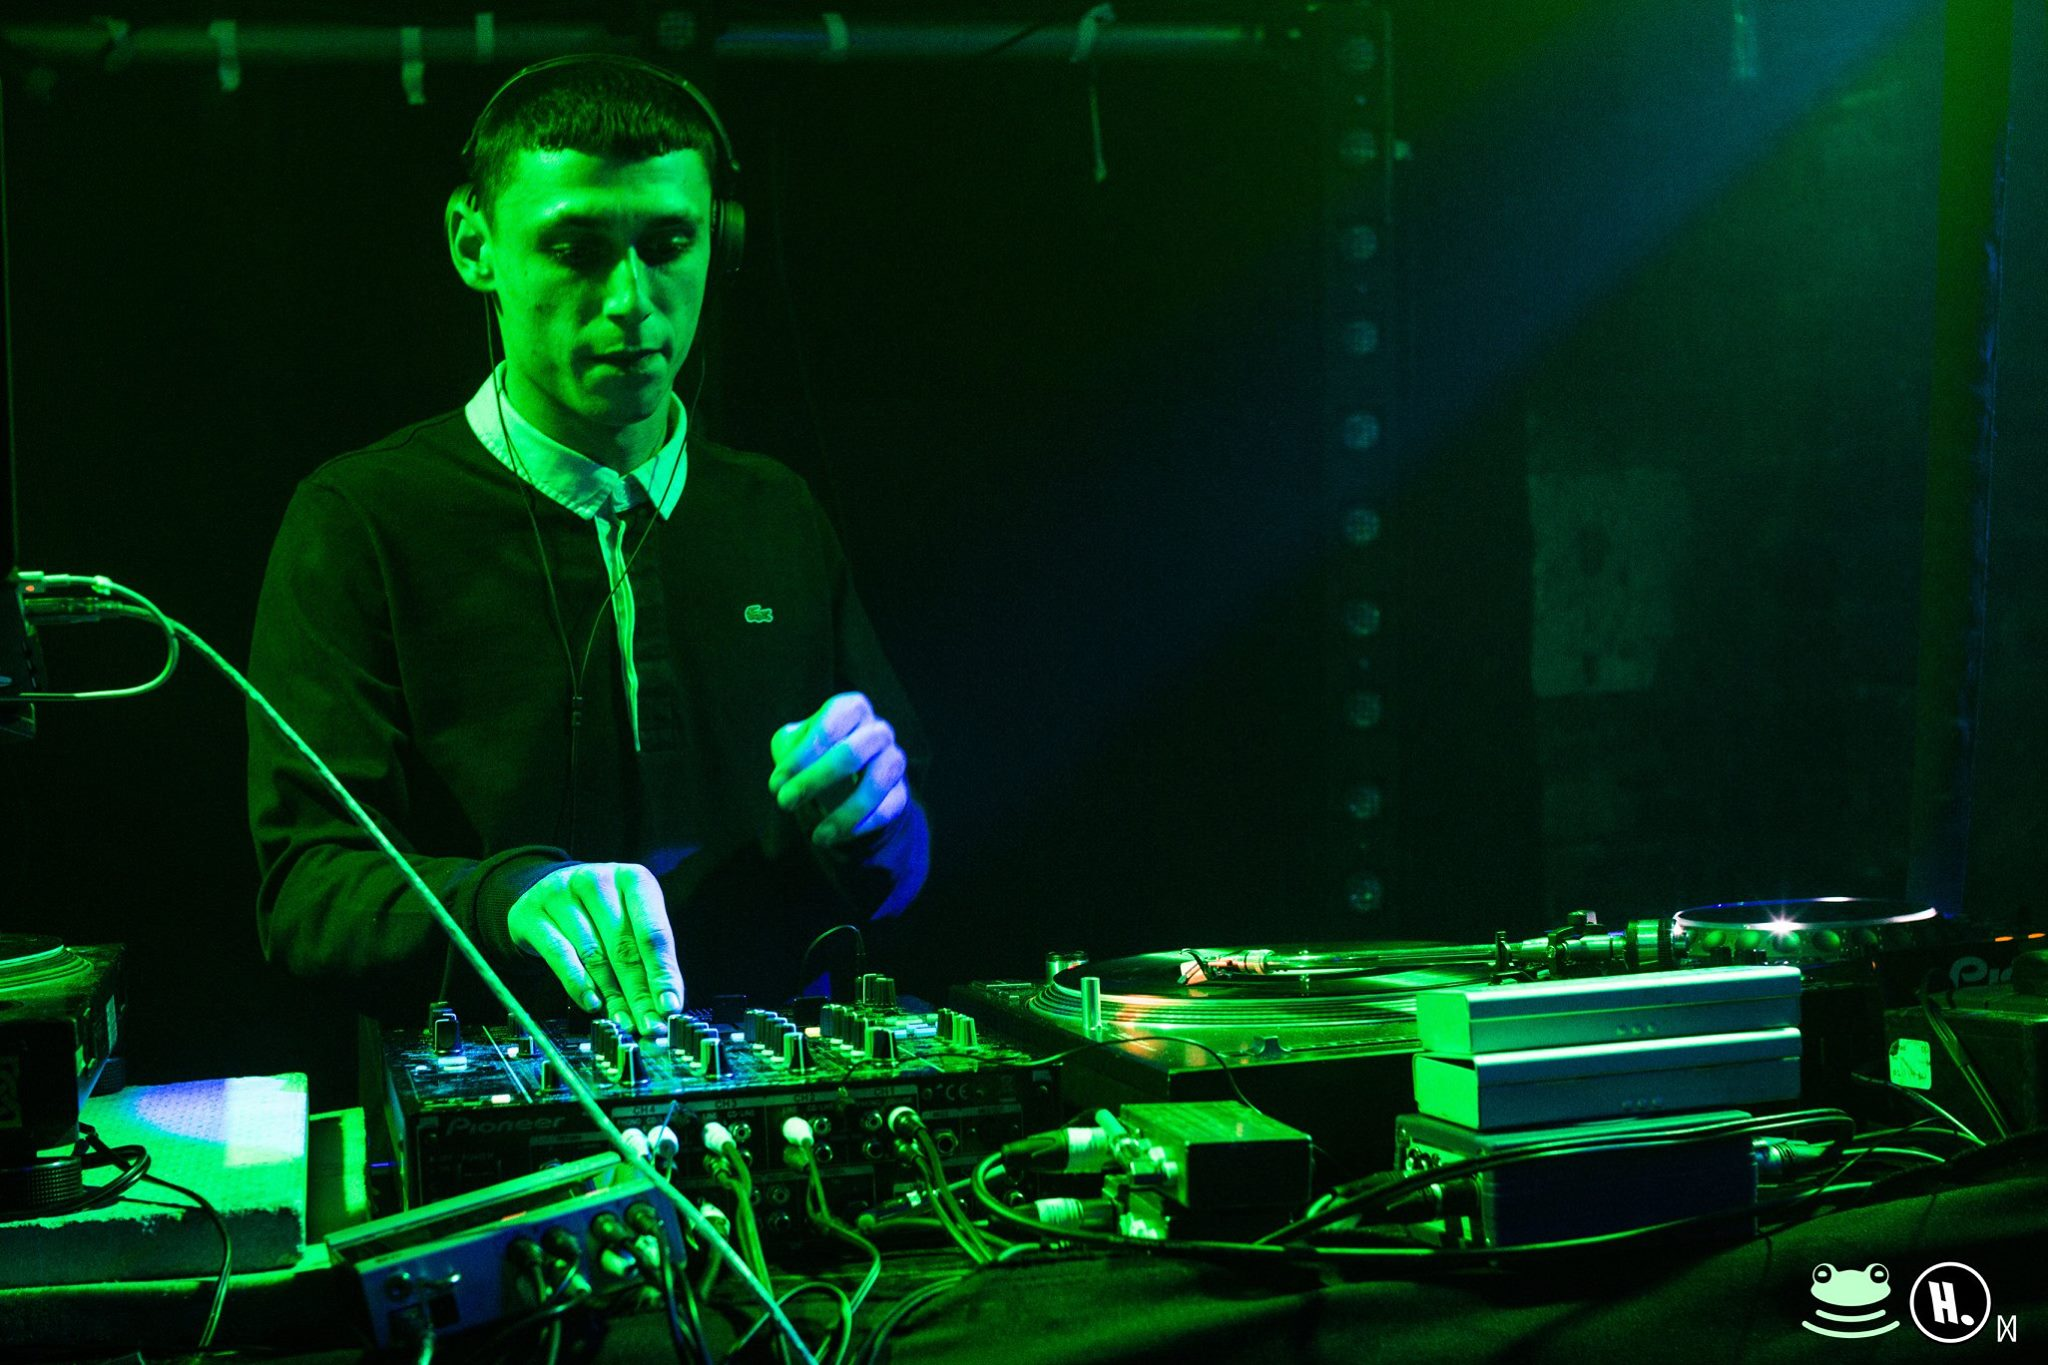 Kriminal - DJ